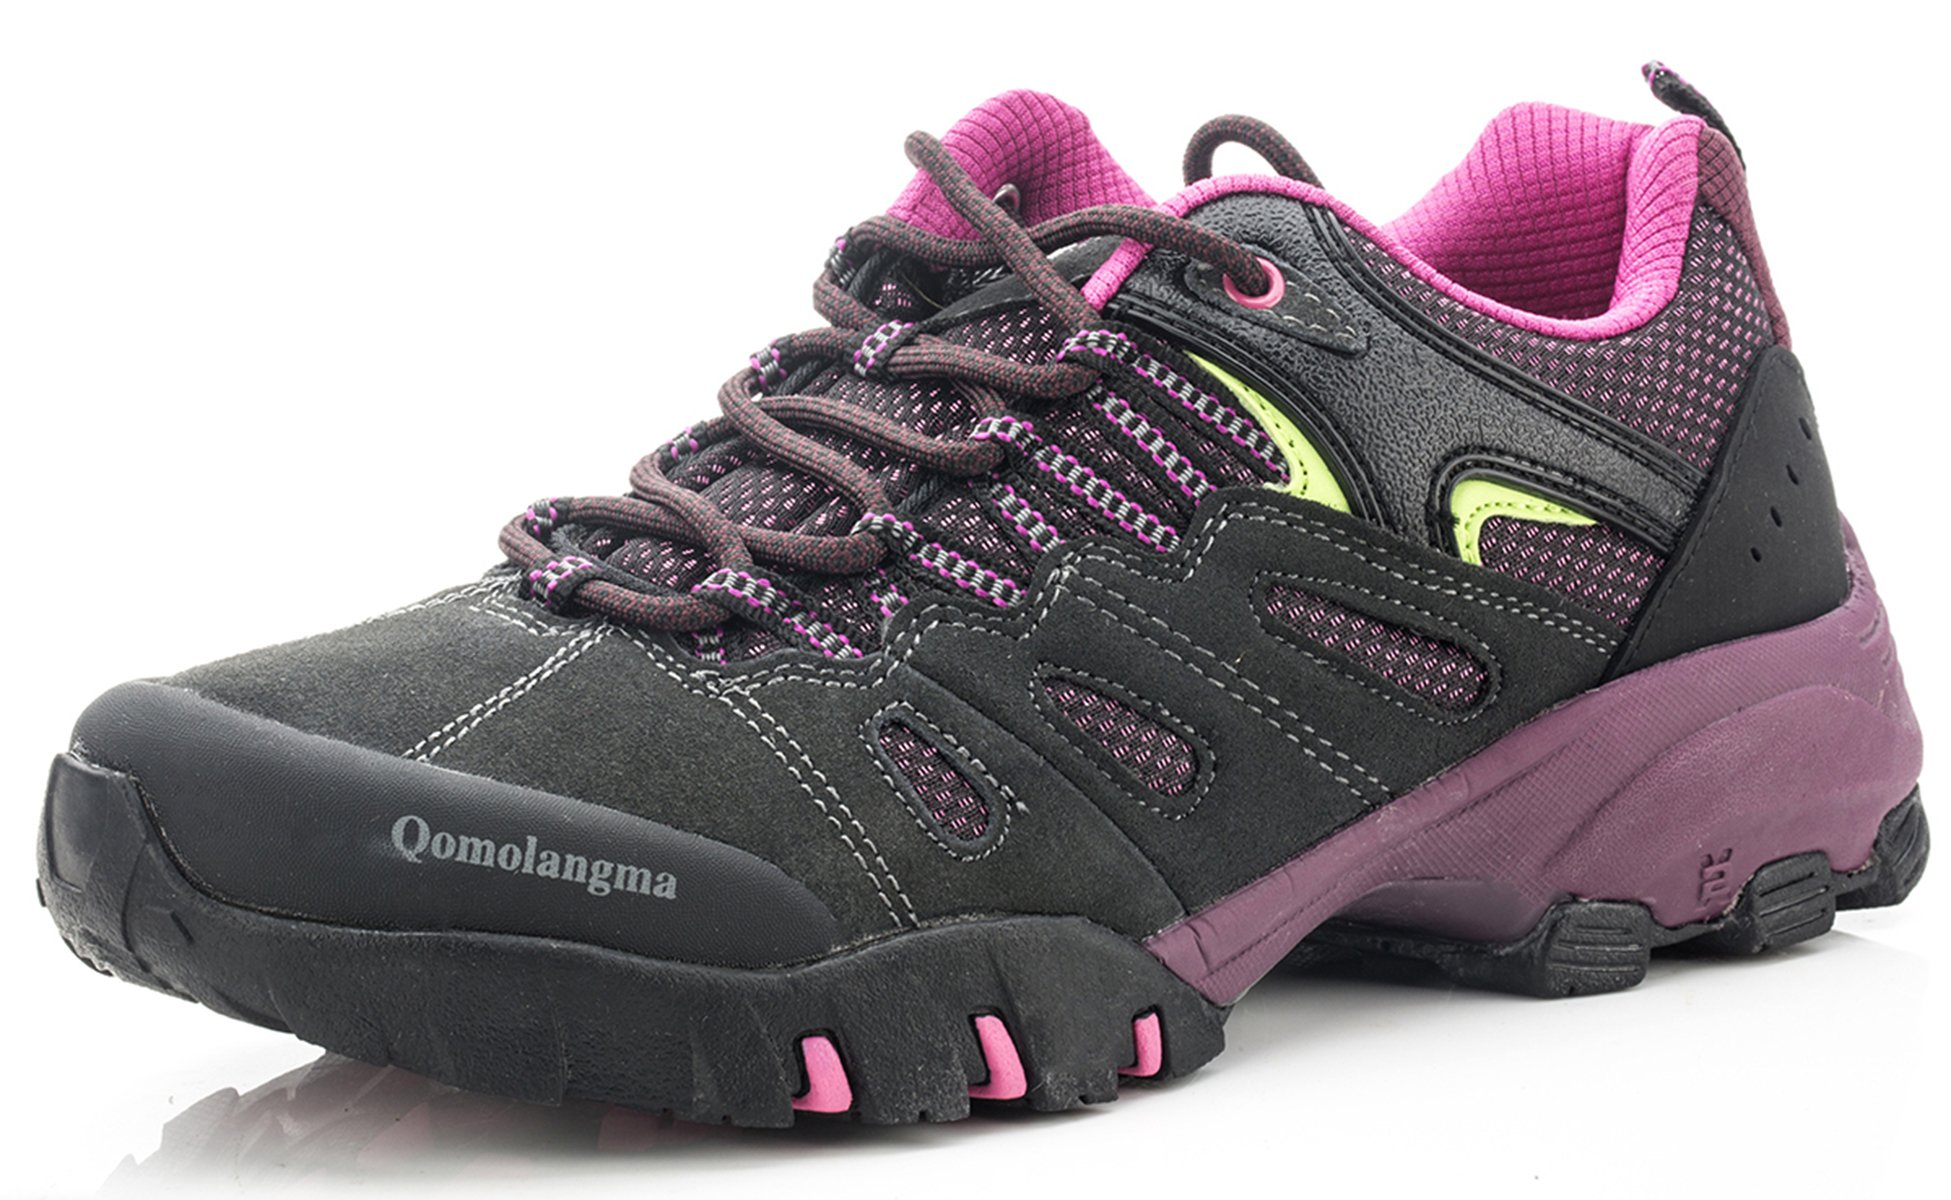 QOMOLANGMA Women's Hiking Shoes Skid-Proof Walking Sneaker For Running Trekking Outdoor Training Grey/Purple 8.5